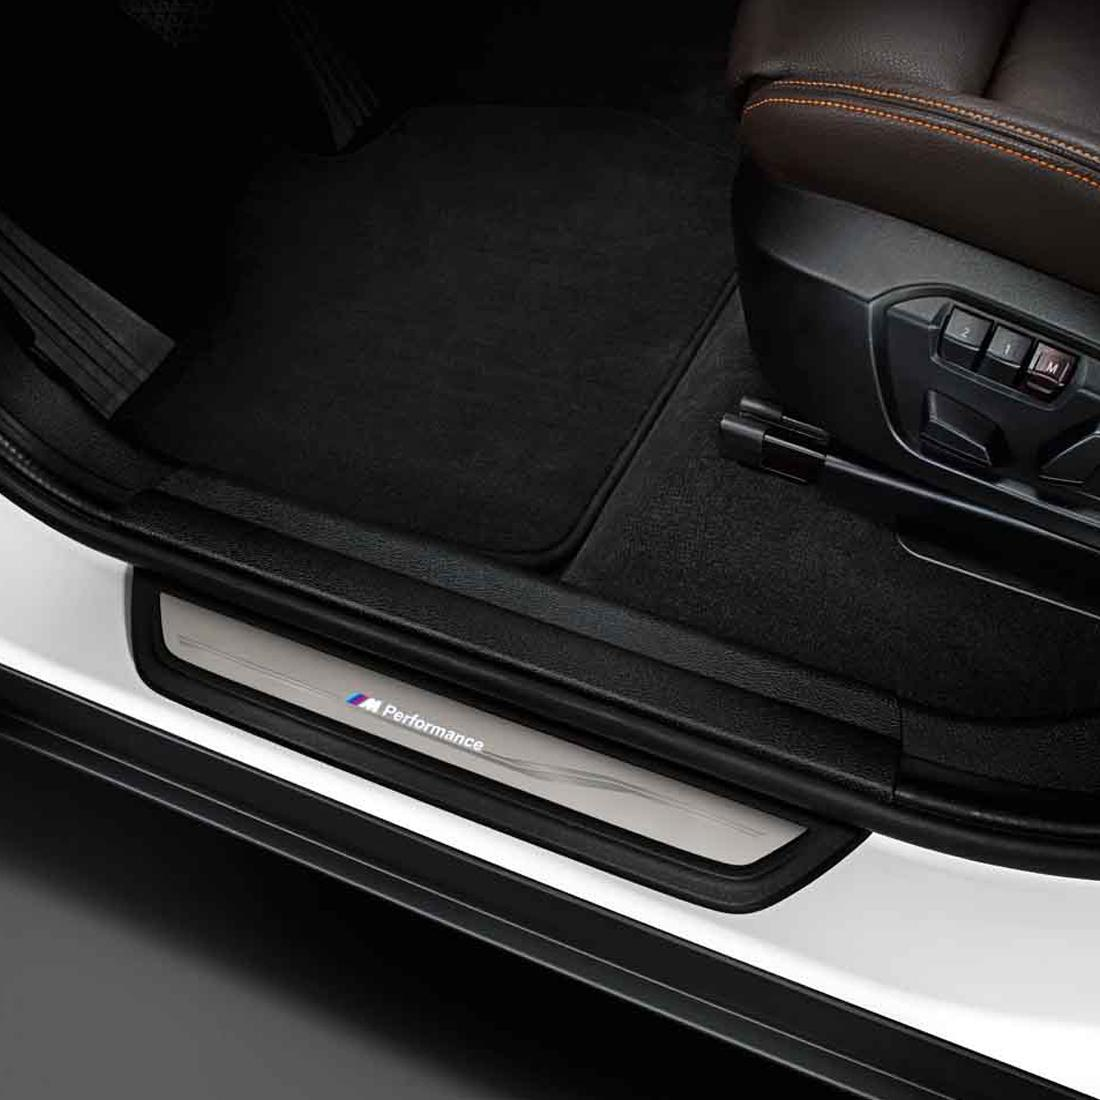 BMW M Performance Illuminated Door Sills & ShopBMWUSA.com: BMW M PERFORMANCE ILLUMINATED DOOR SILLS